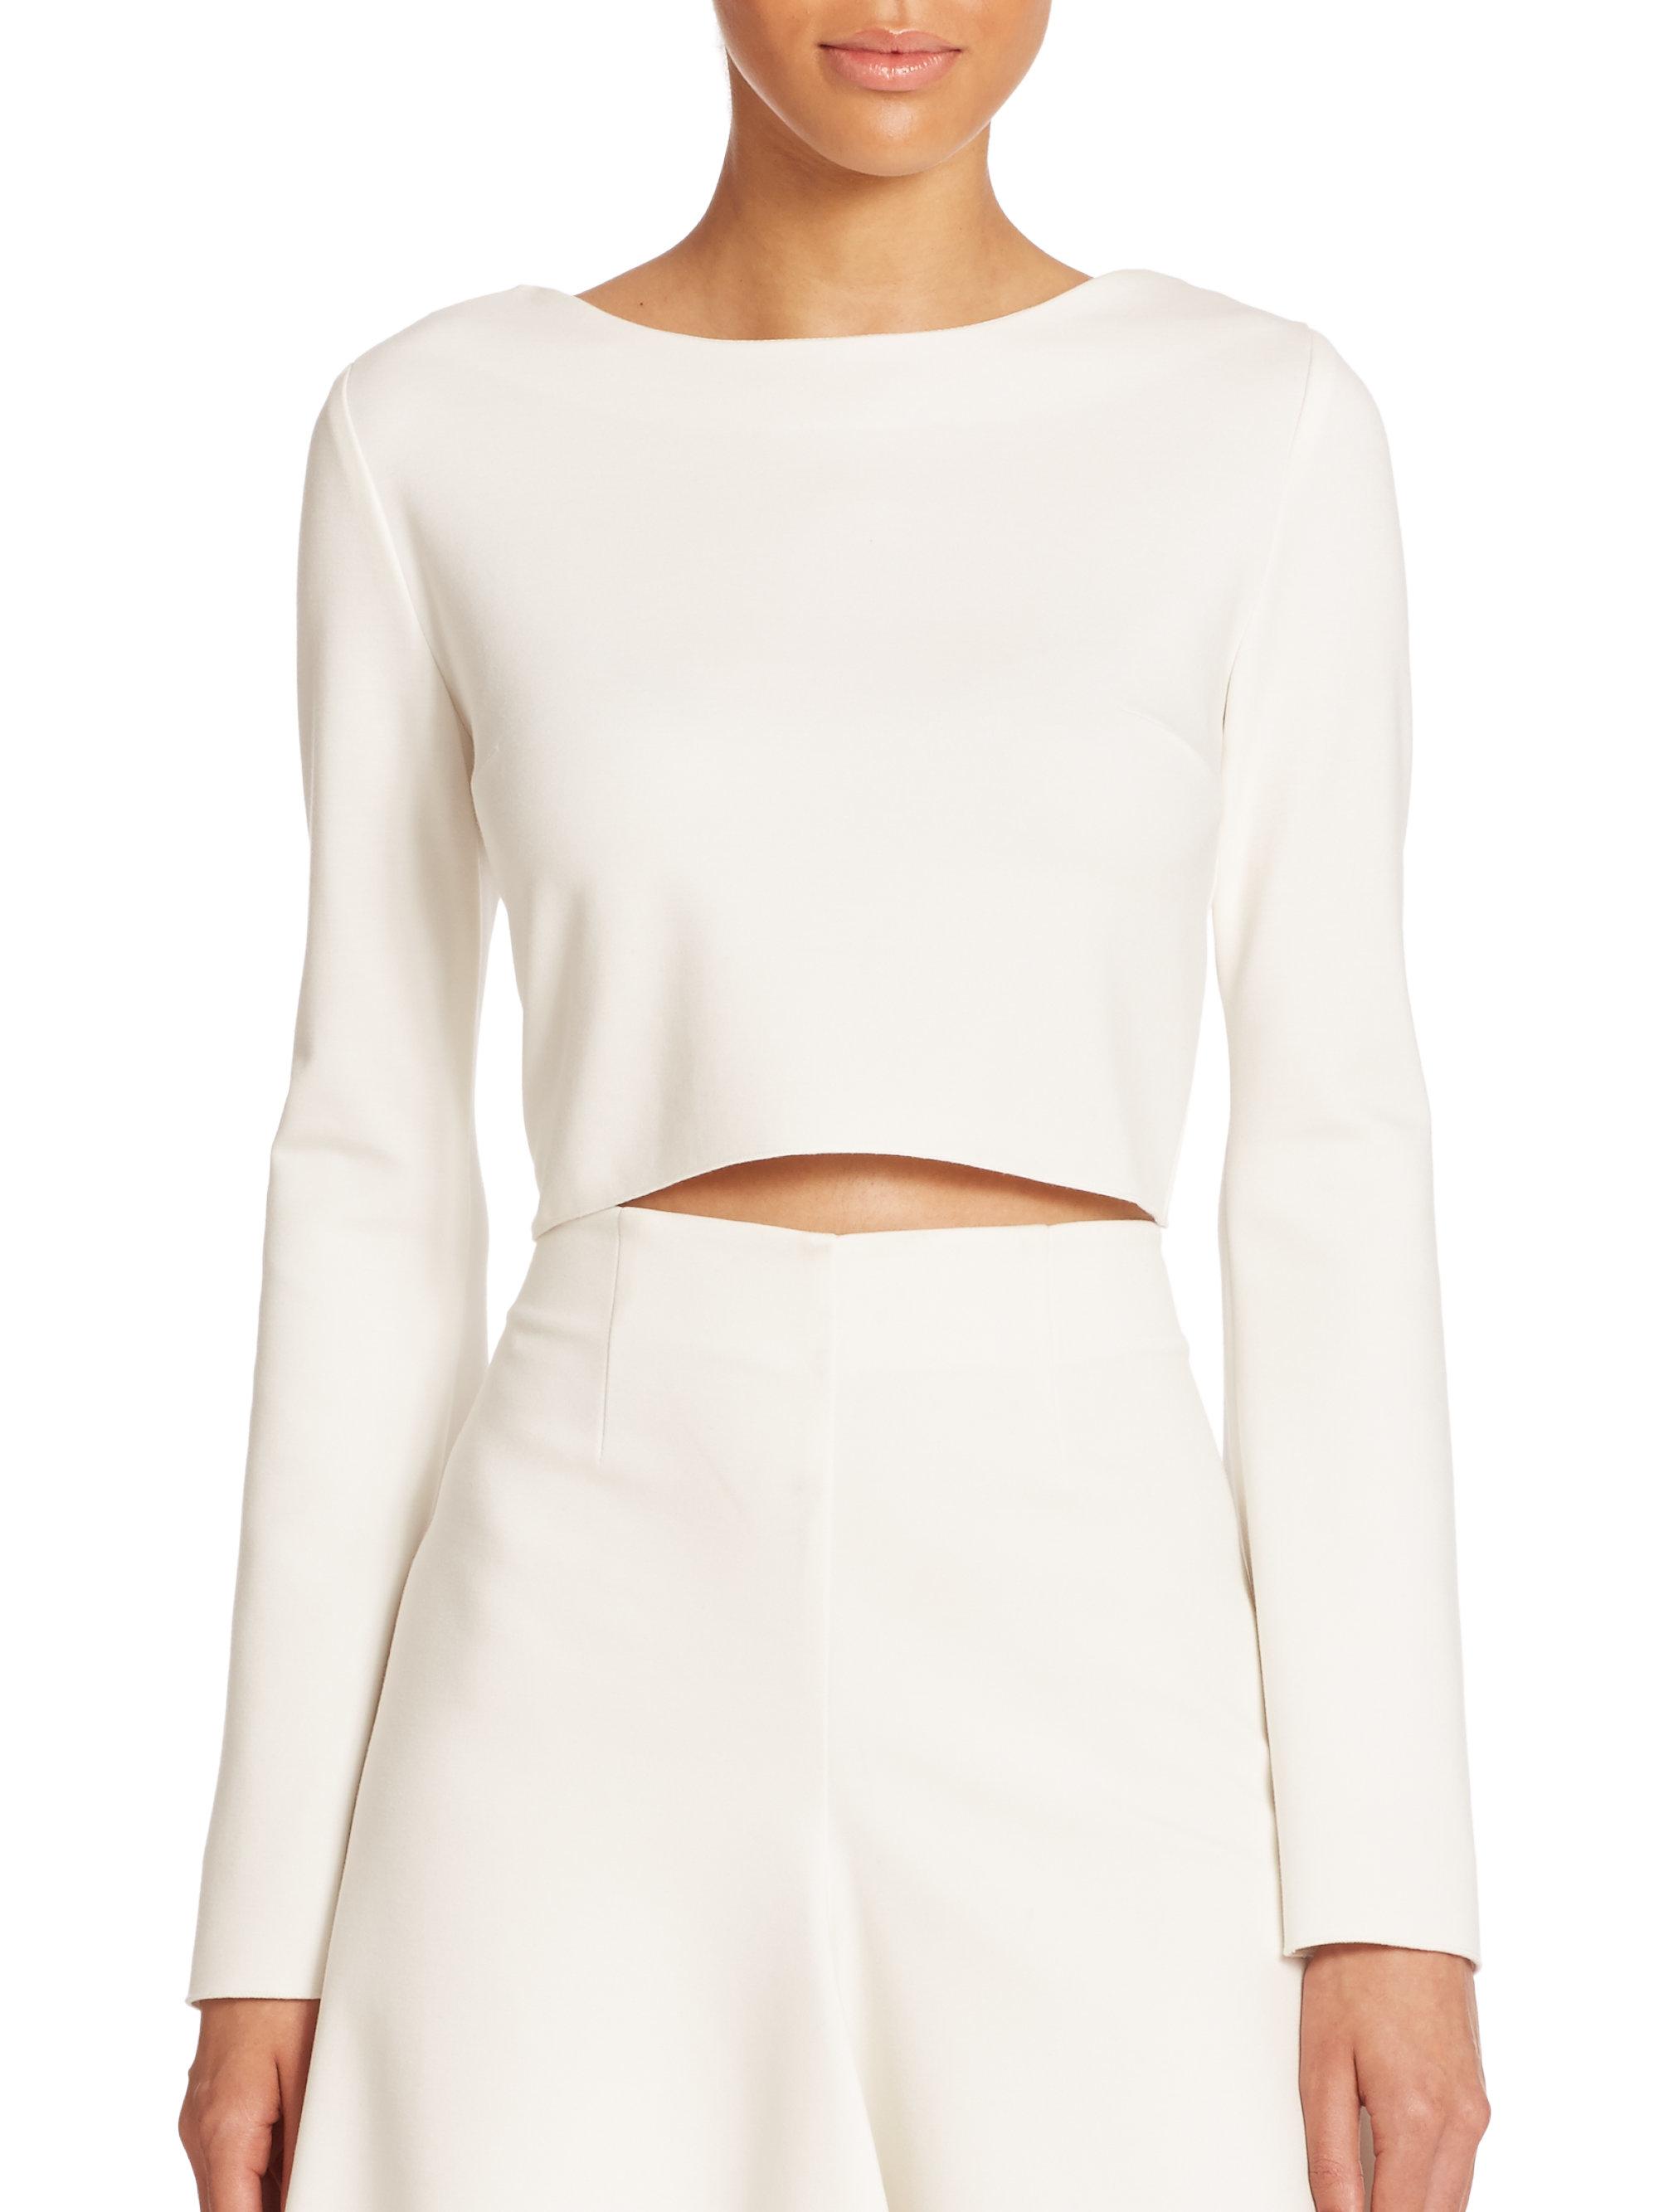 Explore Sale Online Nicholas Woman Lace-up Quilted Ponte Top White Size 0 Nicholas Cheap Shopping Online Cheap Wholesale Price Free Shipping 2018 Unisex vo5SC2